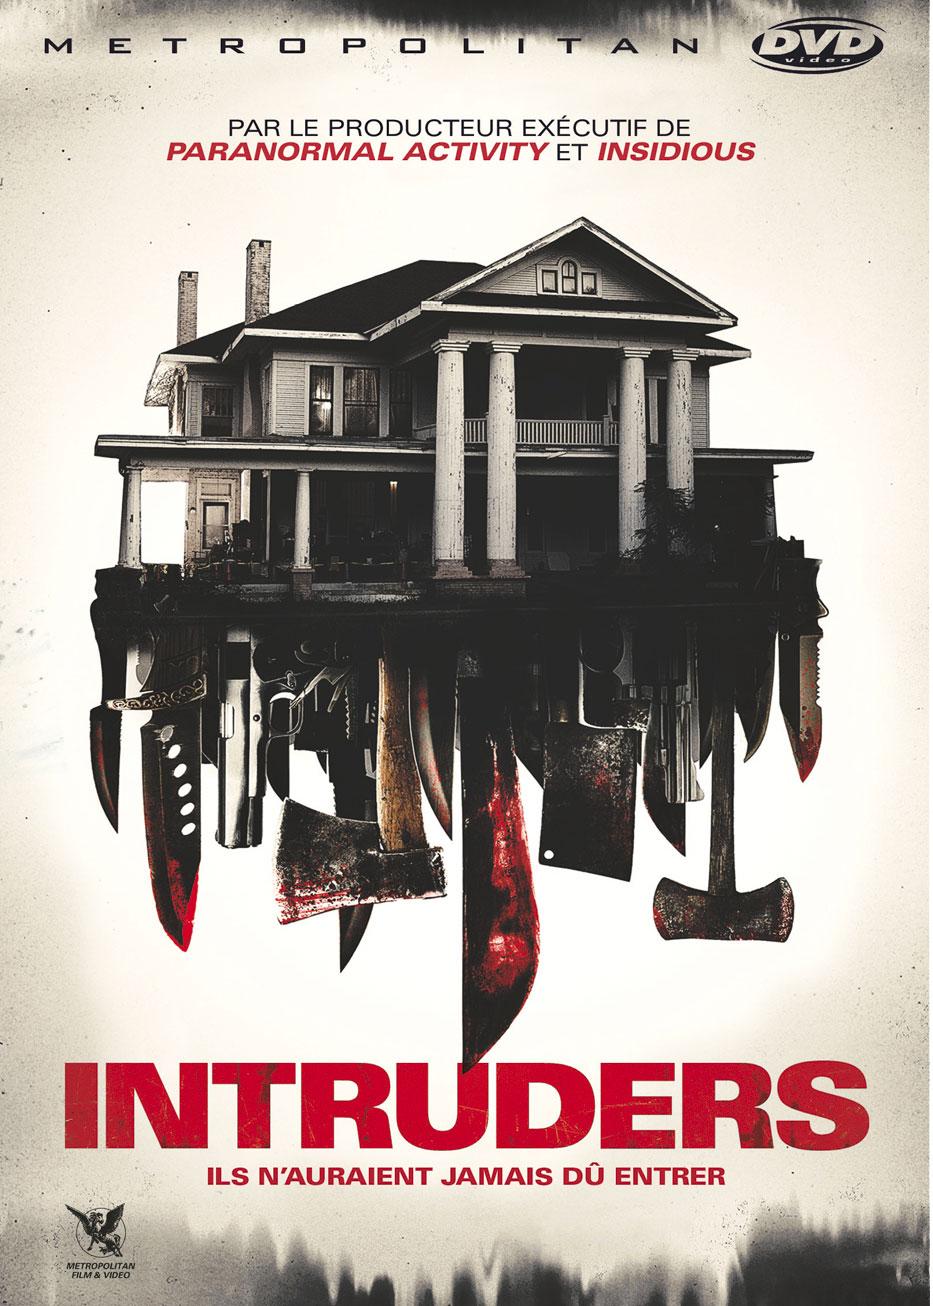 Intruders ddl